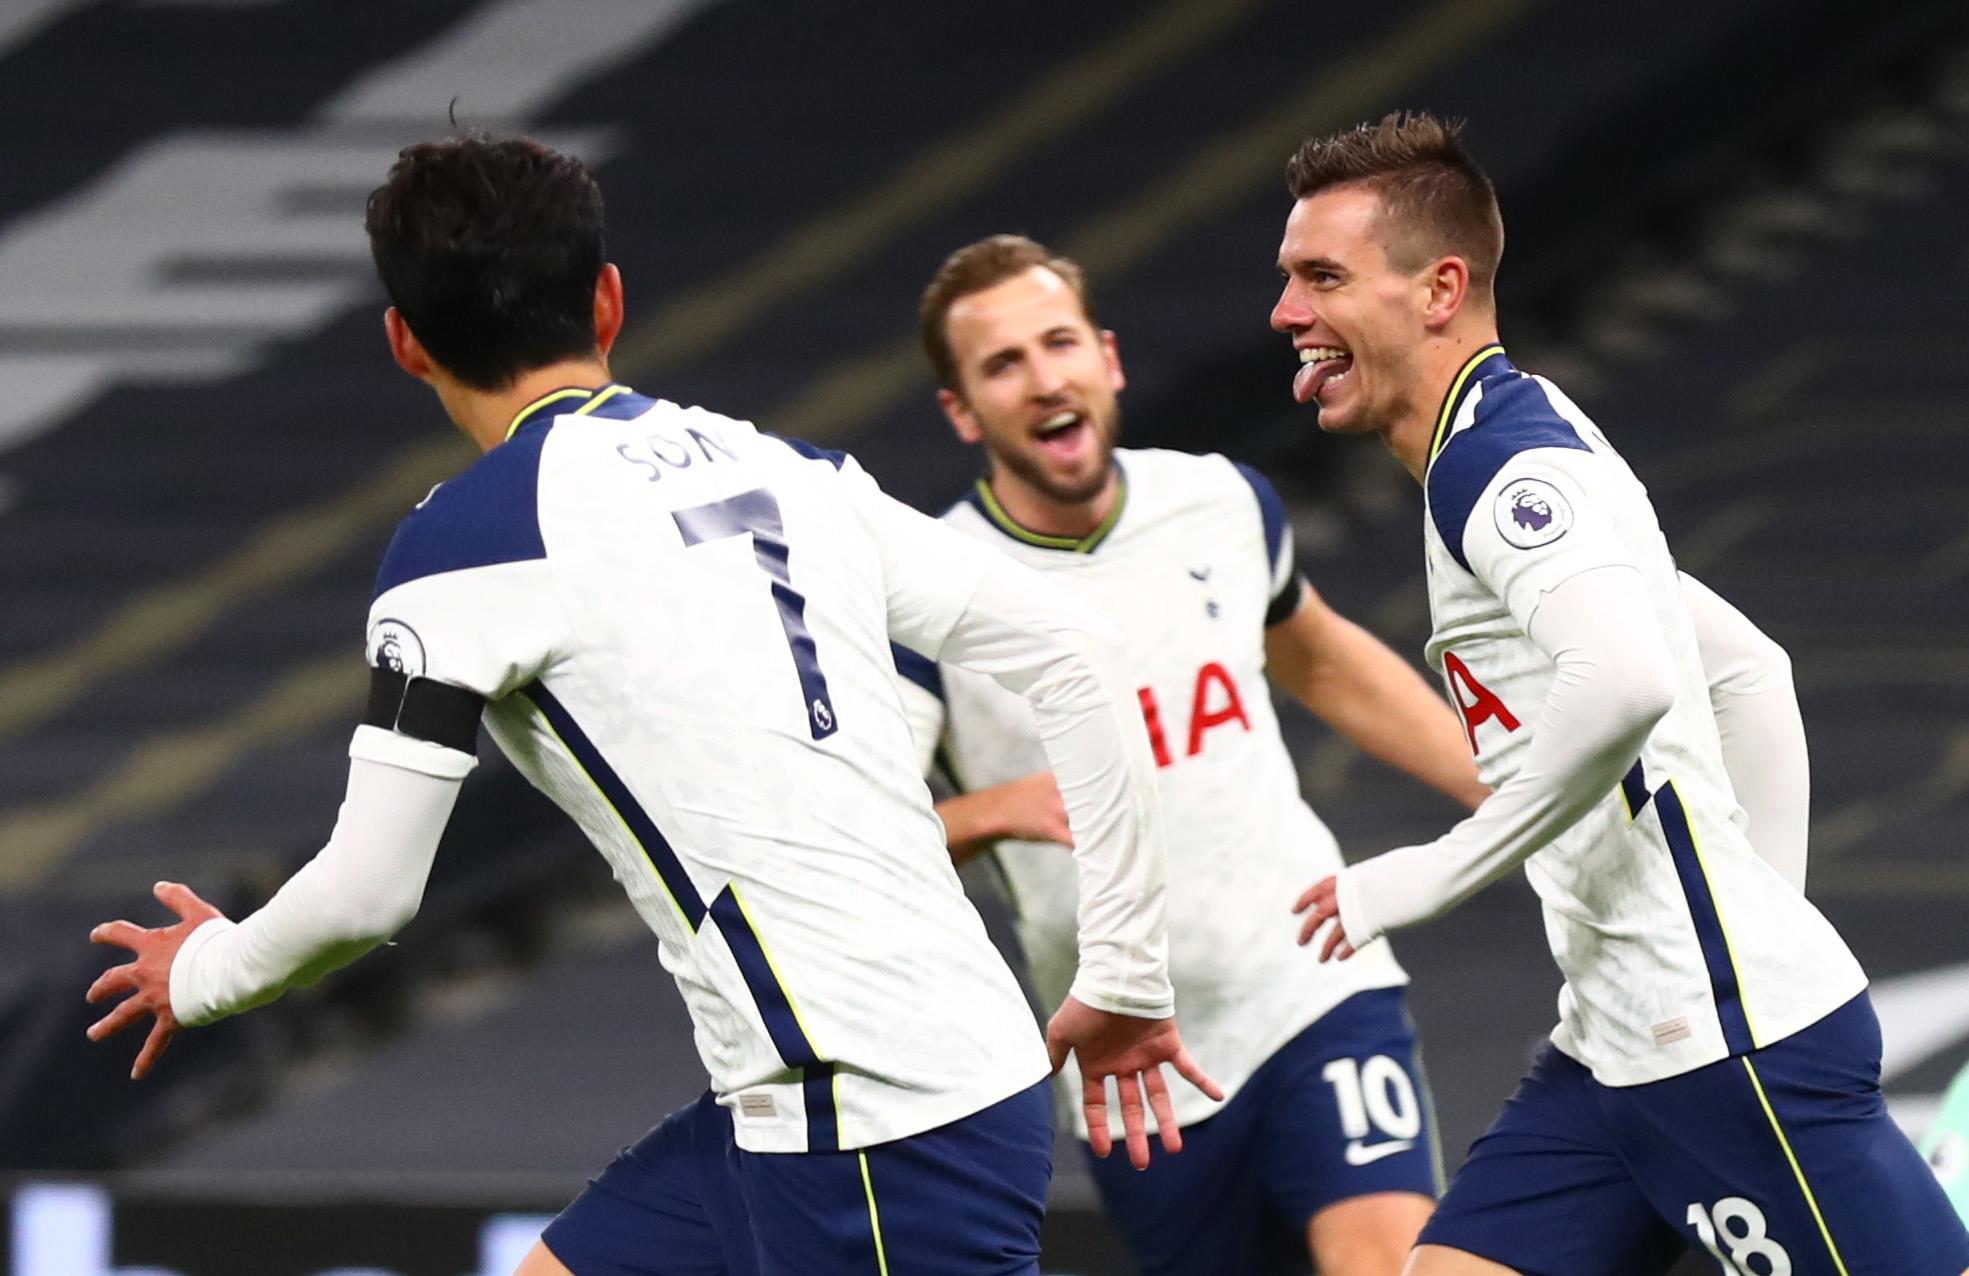 Tottenham 2-0 Manchester City